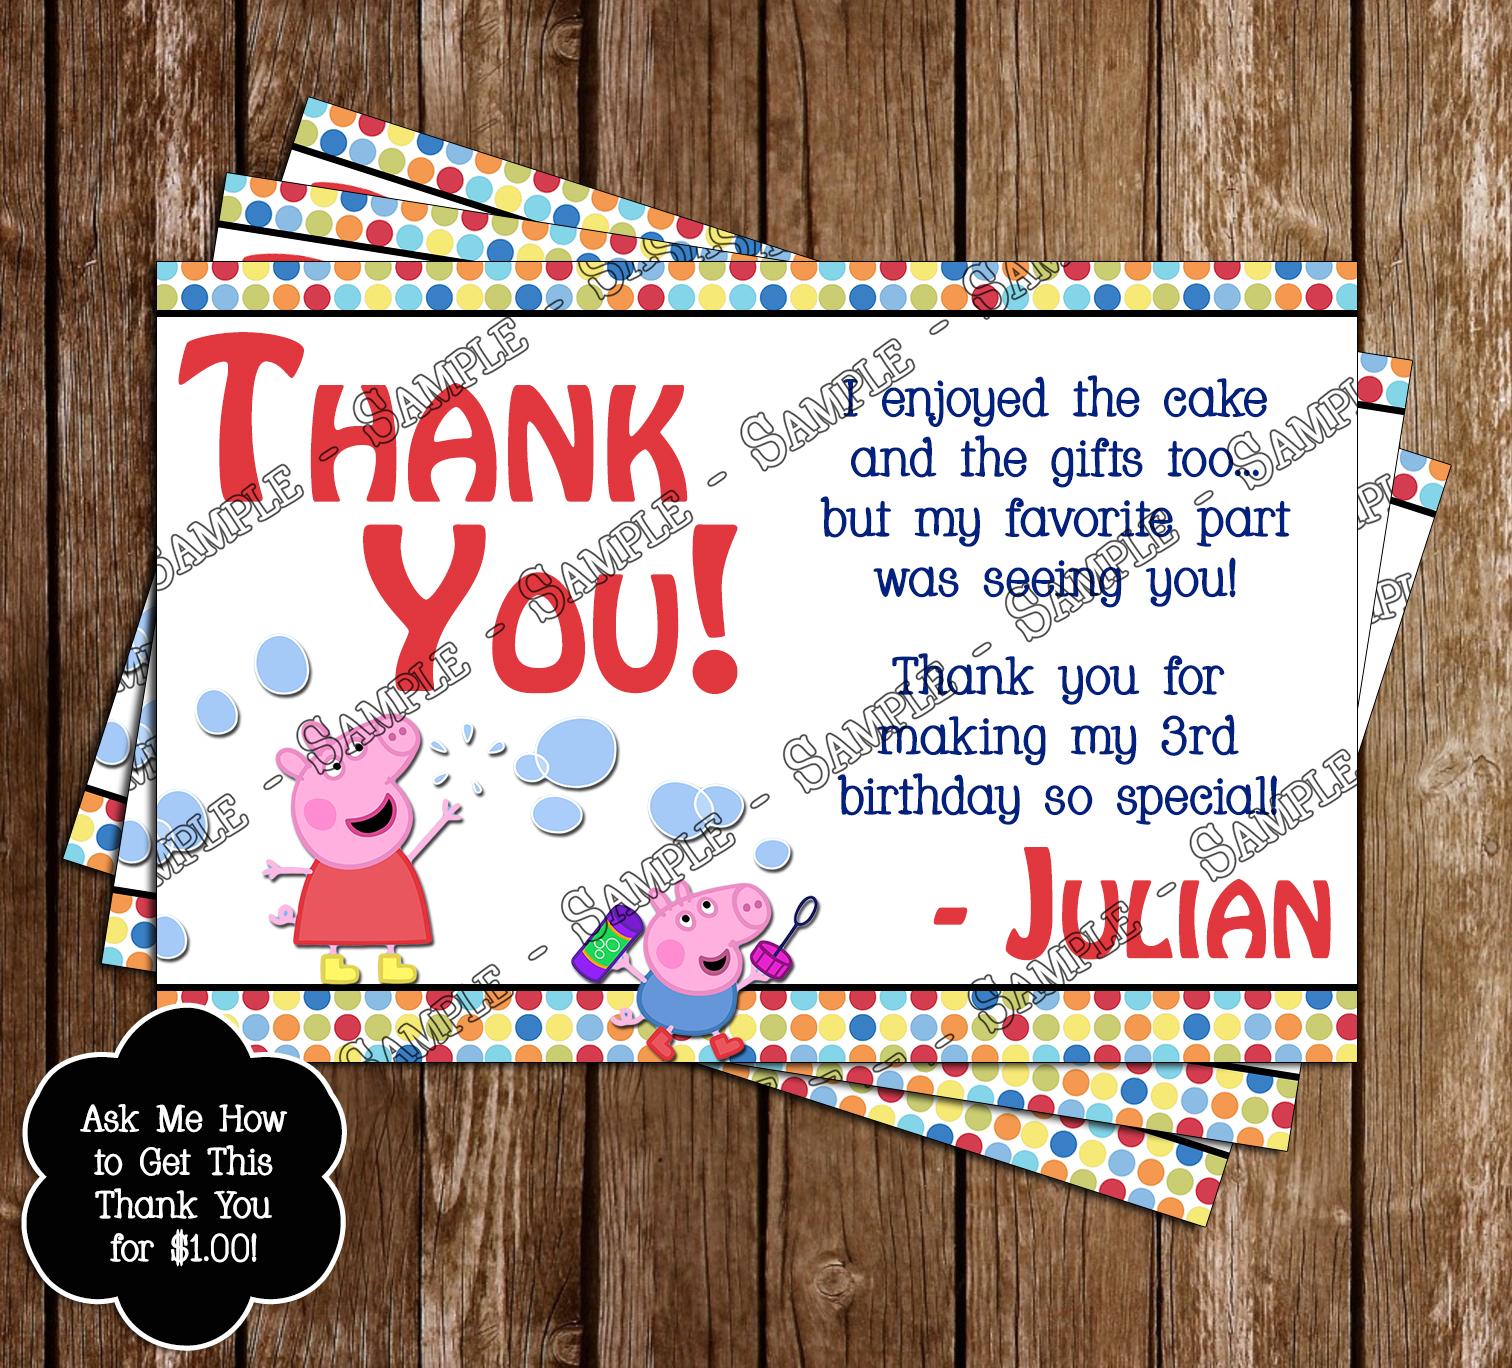 Novel concept designs peppa pig birthday invitations and thank you card peppa pig birthday invitations and thank you card filmwisefo